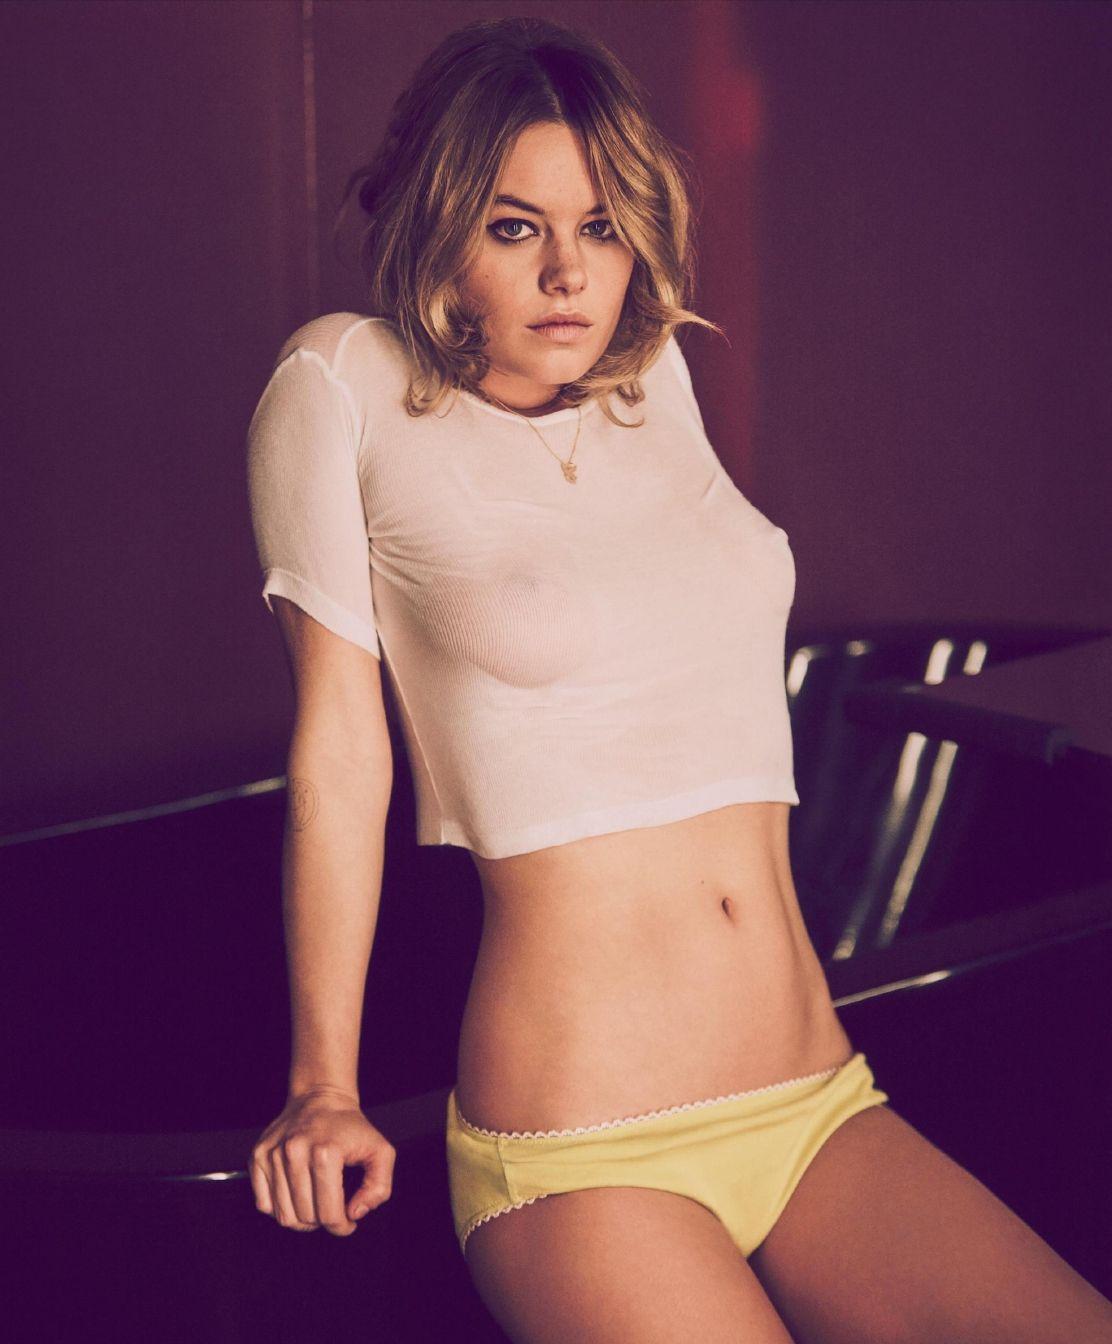 Nikki Benz Fappening,Hannah ware nude sex scene in boss series Porn video Fergie Nude Photos Videos,Katy Perry Bikini Dance, July 2019